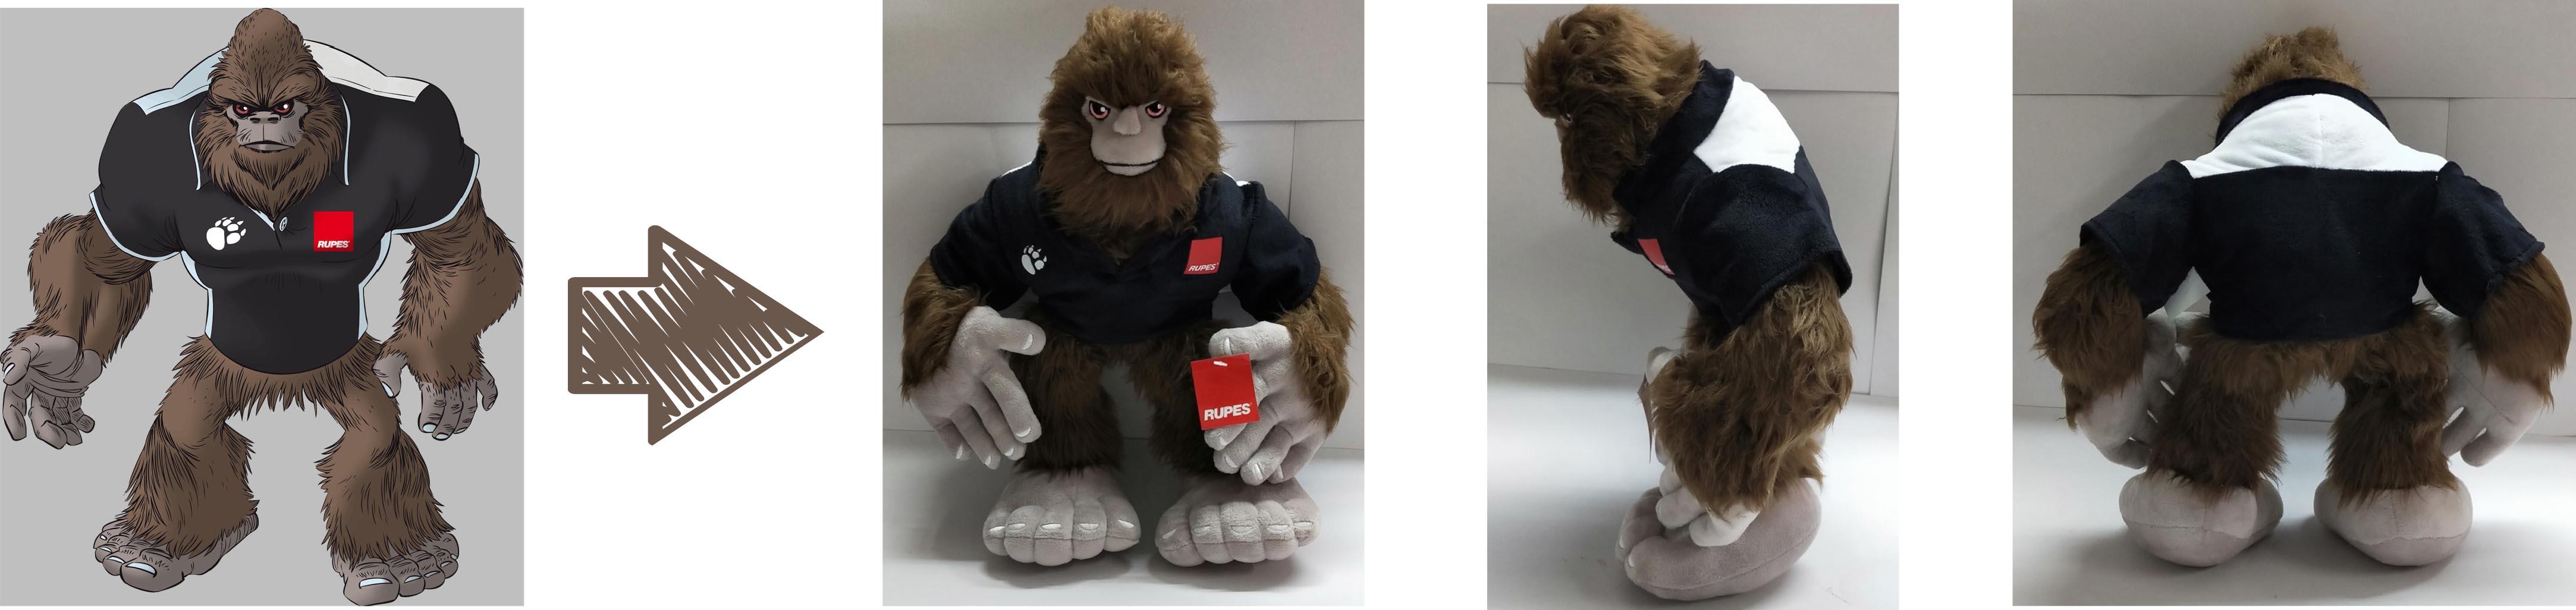 Rupes USA Inc promotional stuffed animal